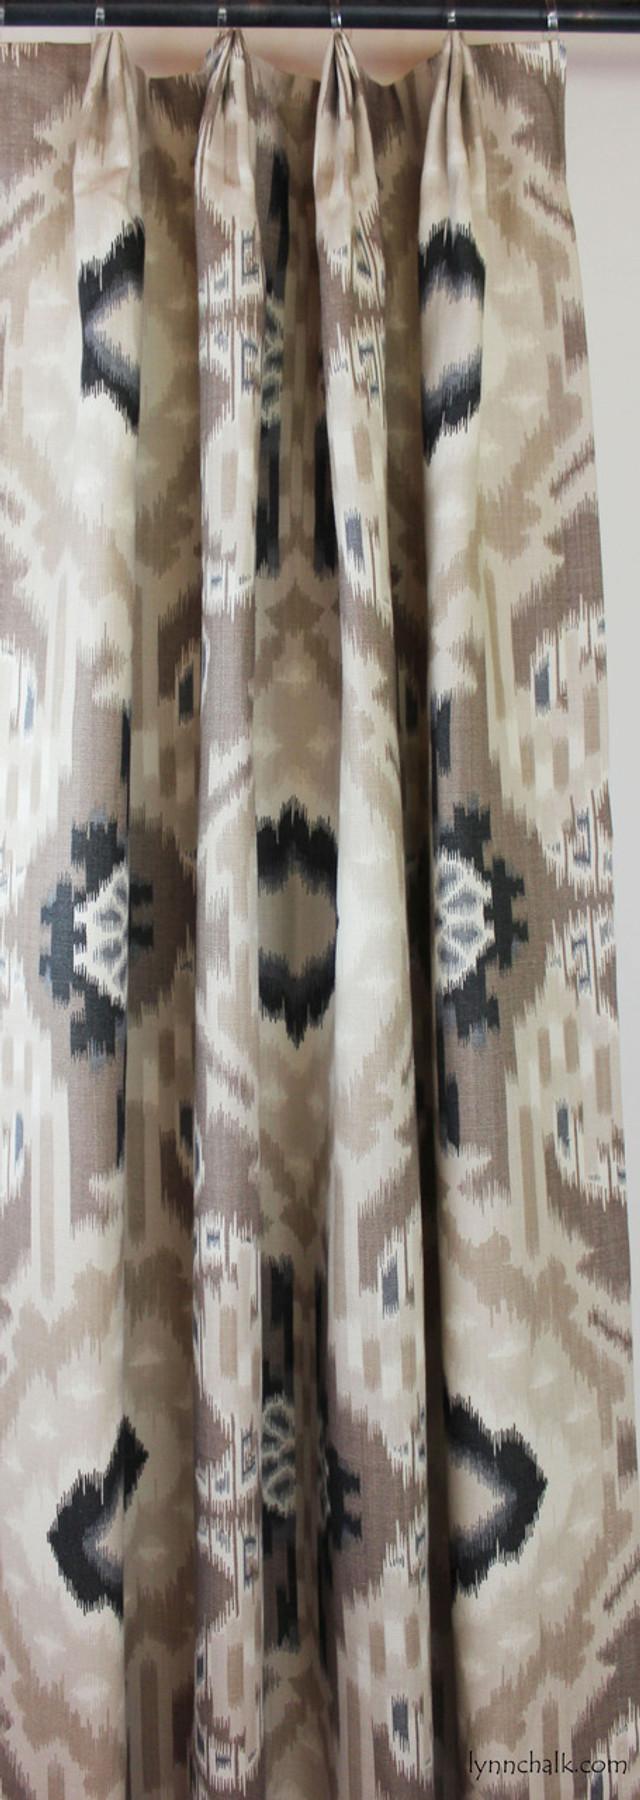 Custom Fan Pleated Drapes in Kiribati Ikat in Linen